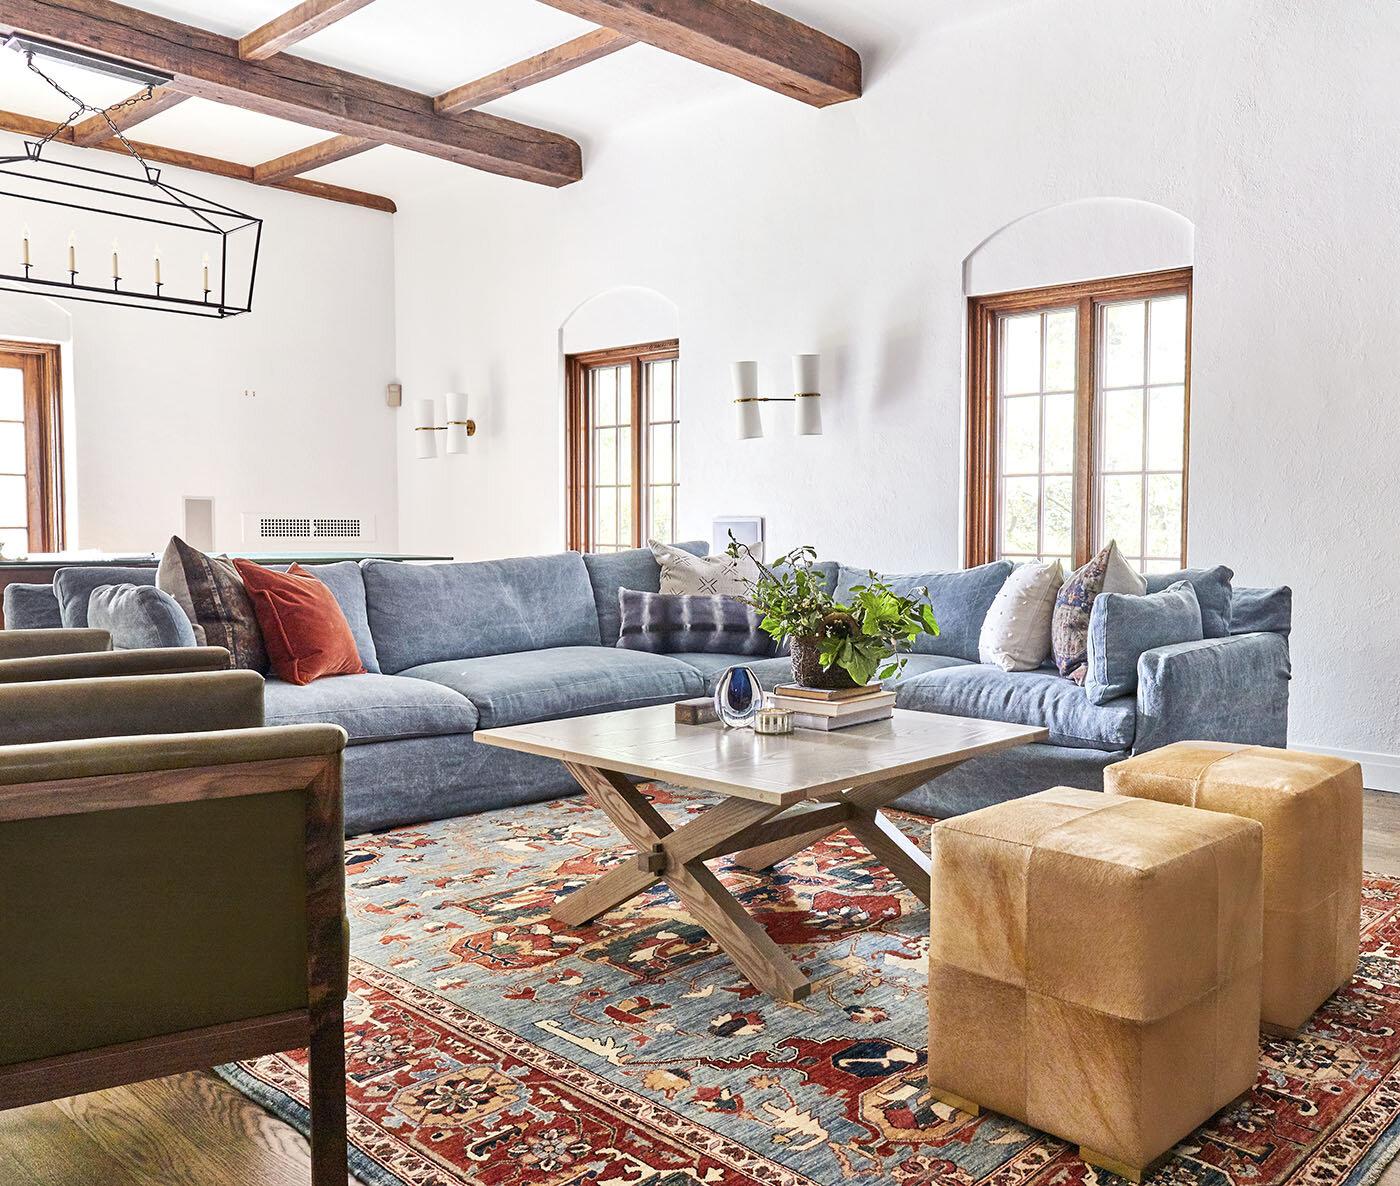 mackenzie-and-company-boston-westwood-interior-design-living-room-style-2